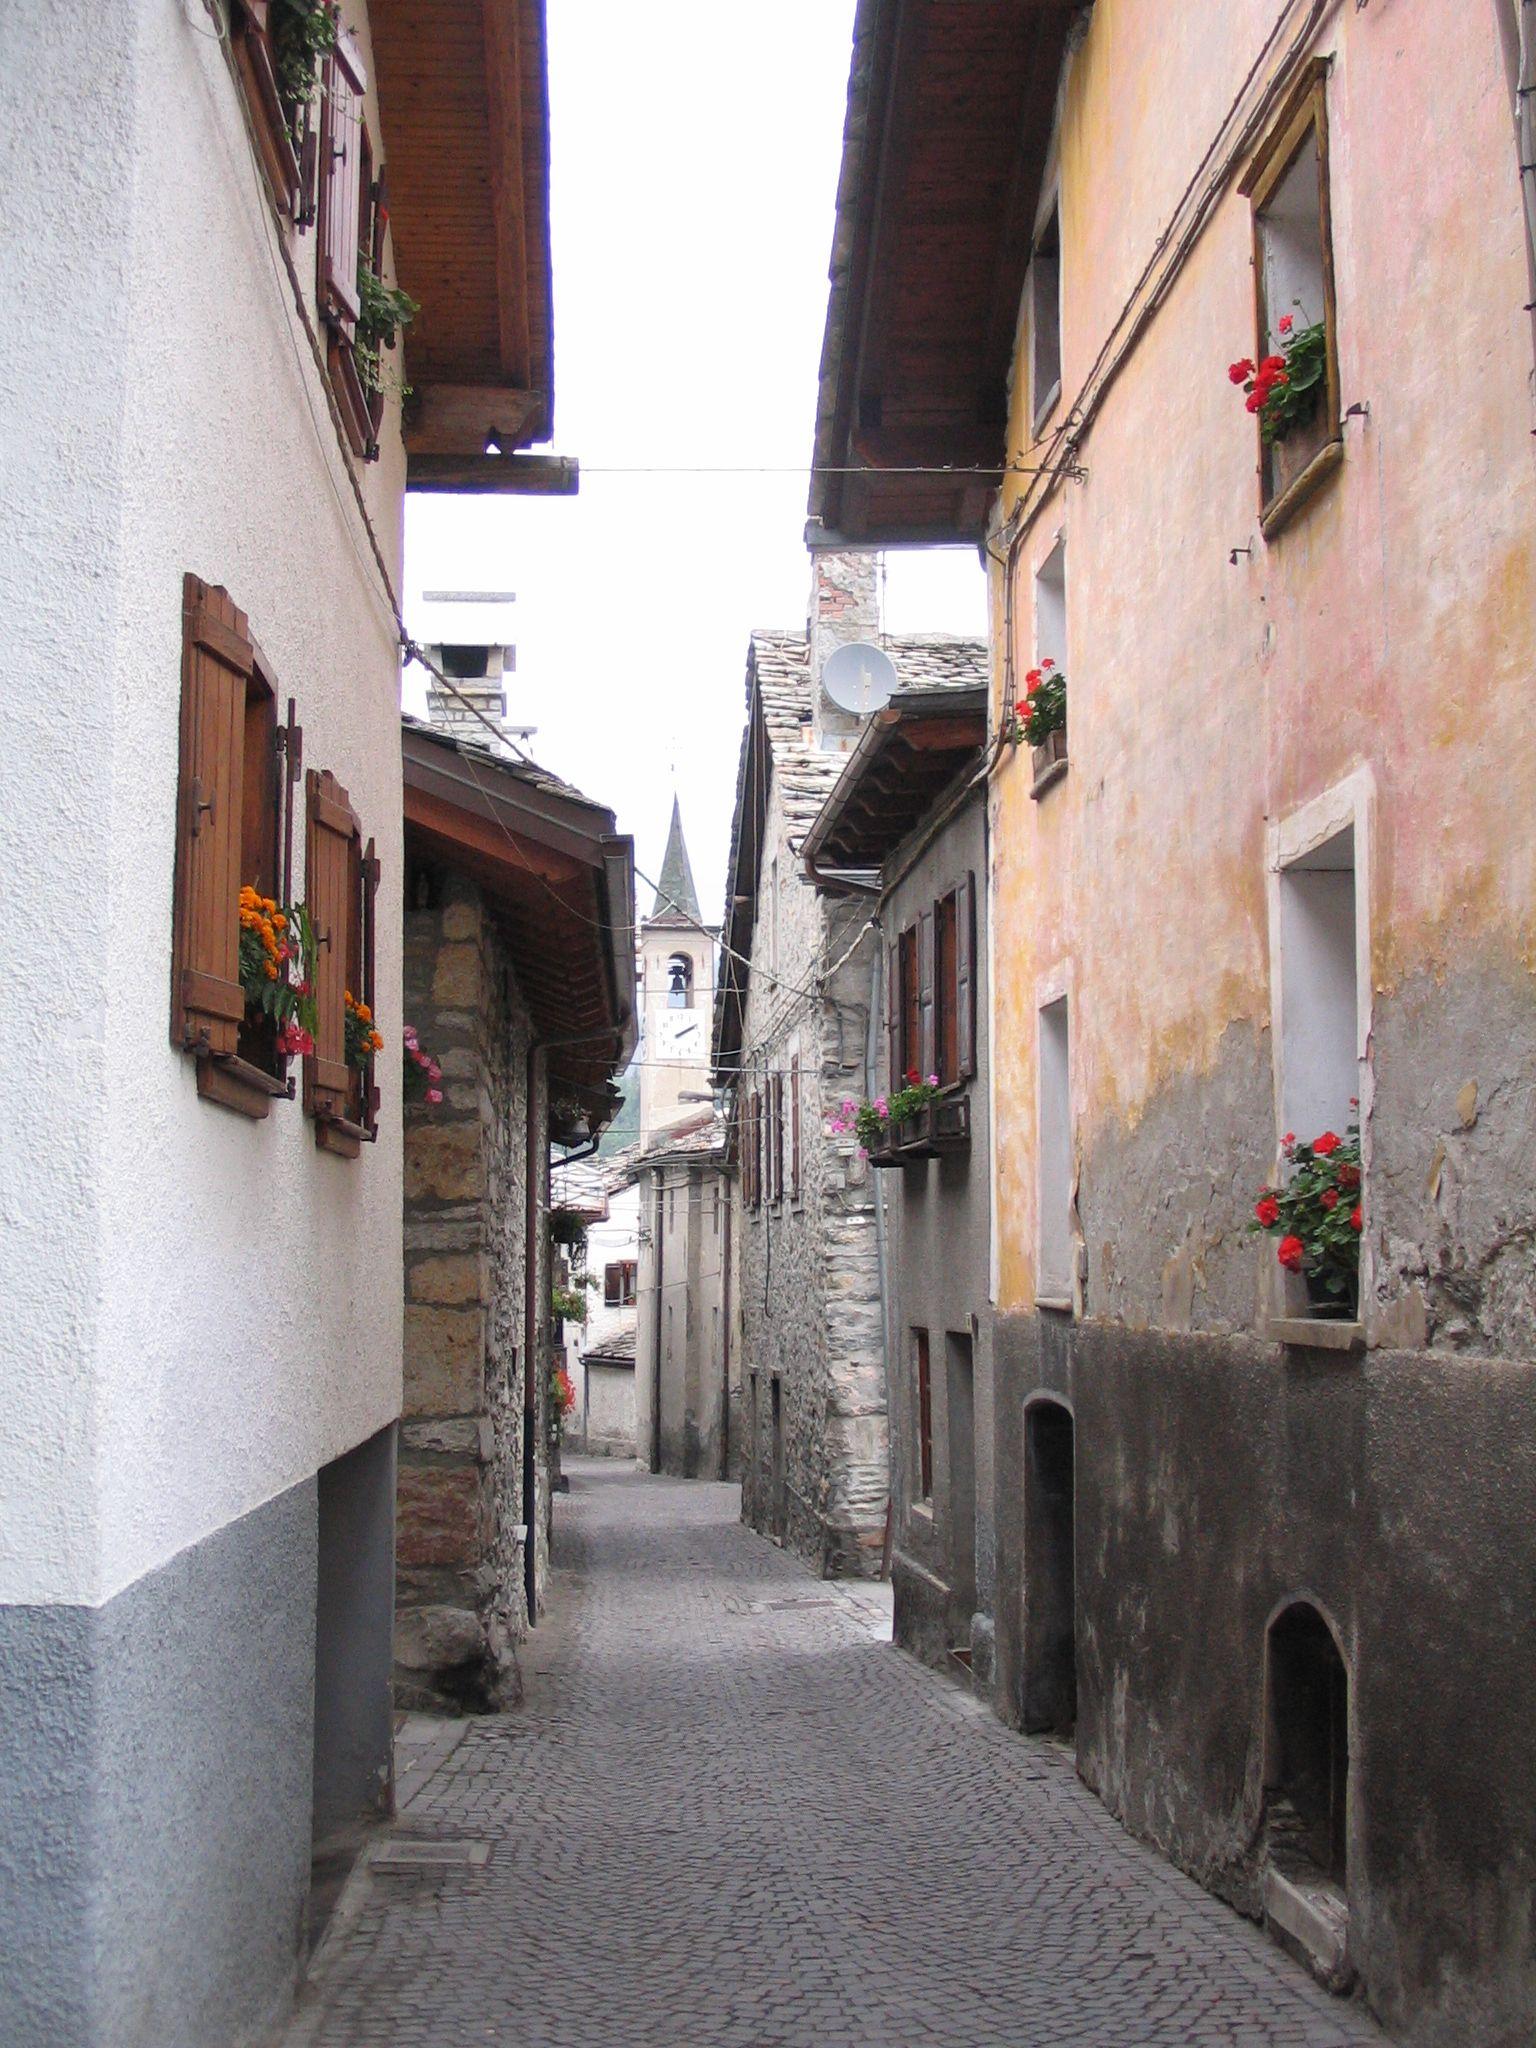 Courmayeur Italy - nice street